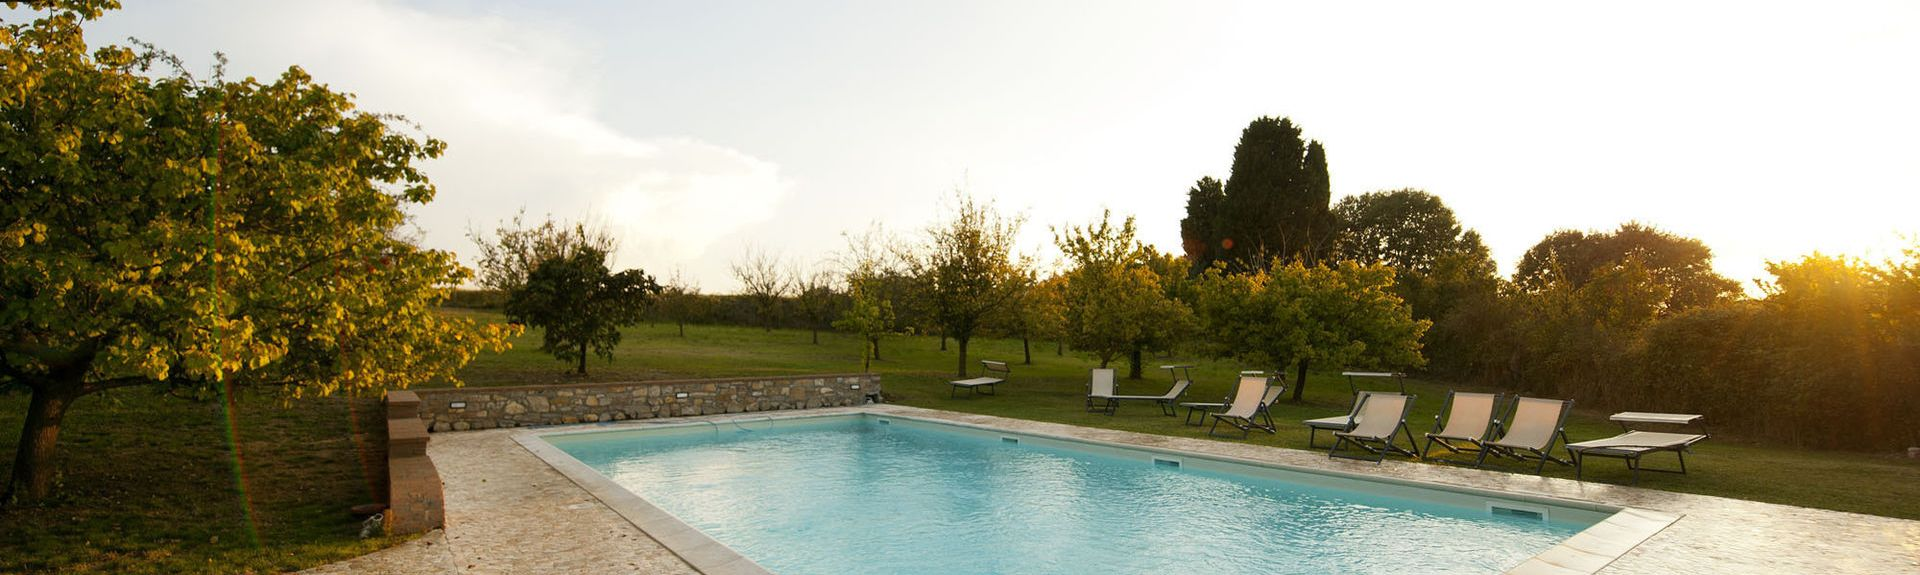 Serre di Rapolano, Rapolano Terme, Tuscany, Italy